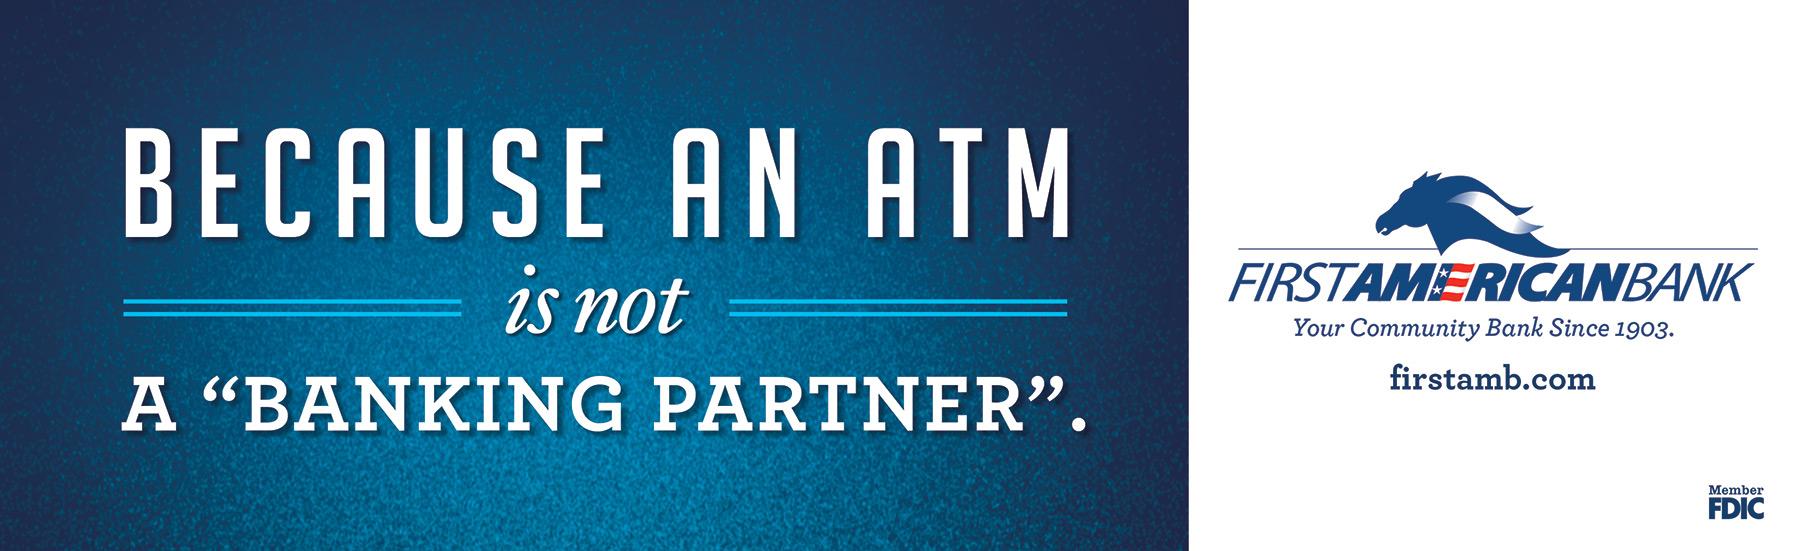 3262.1_FAB_Outdoor_1_ATM-BankingPartner_HR